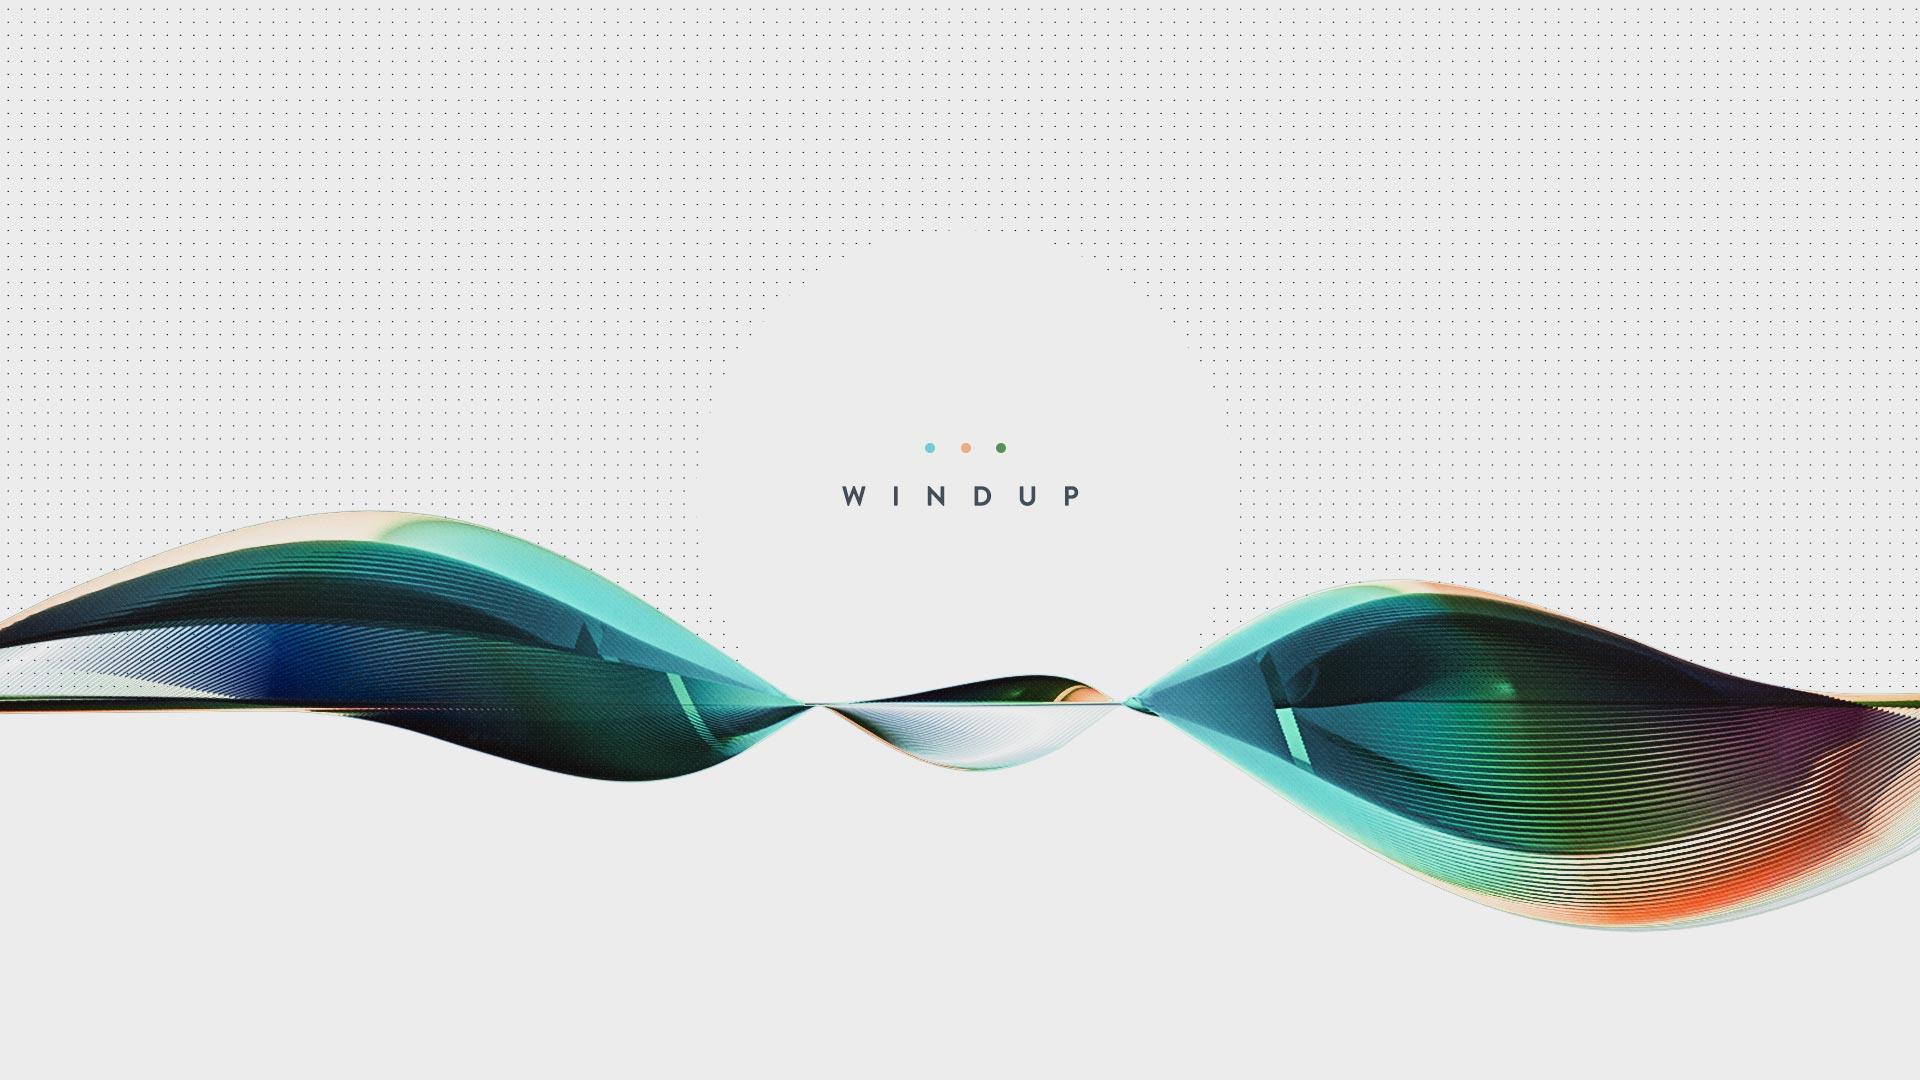 Windup_Title_001